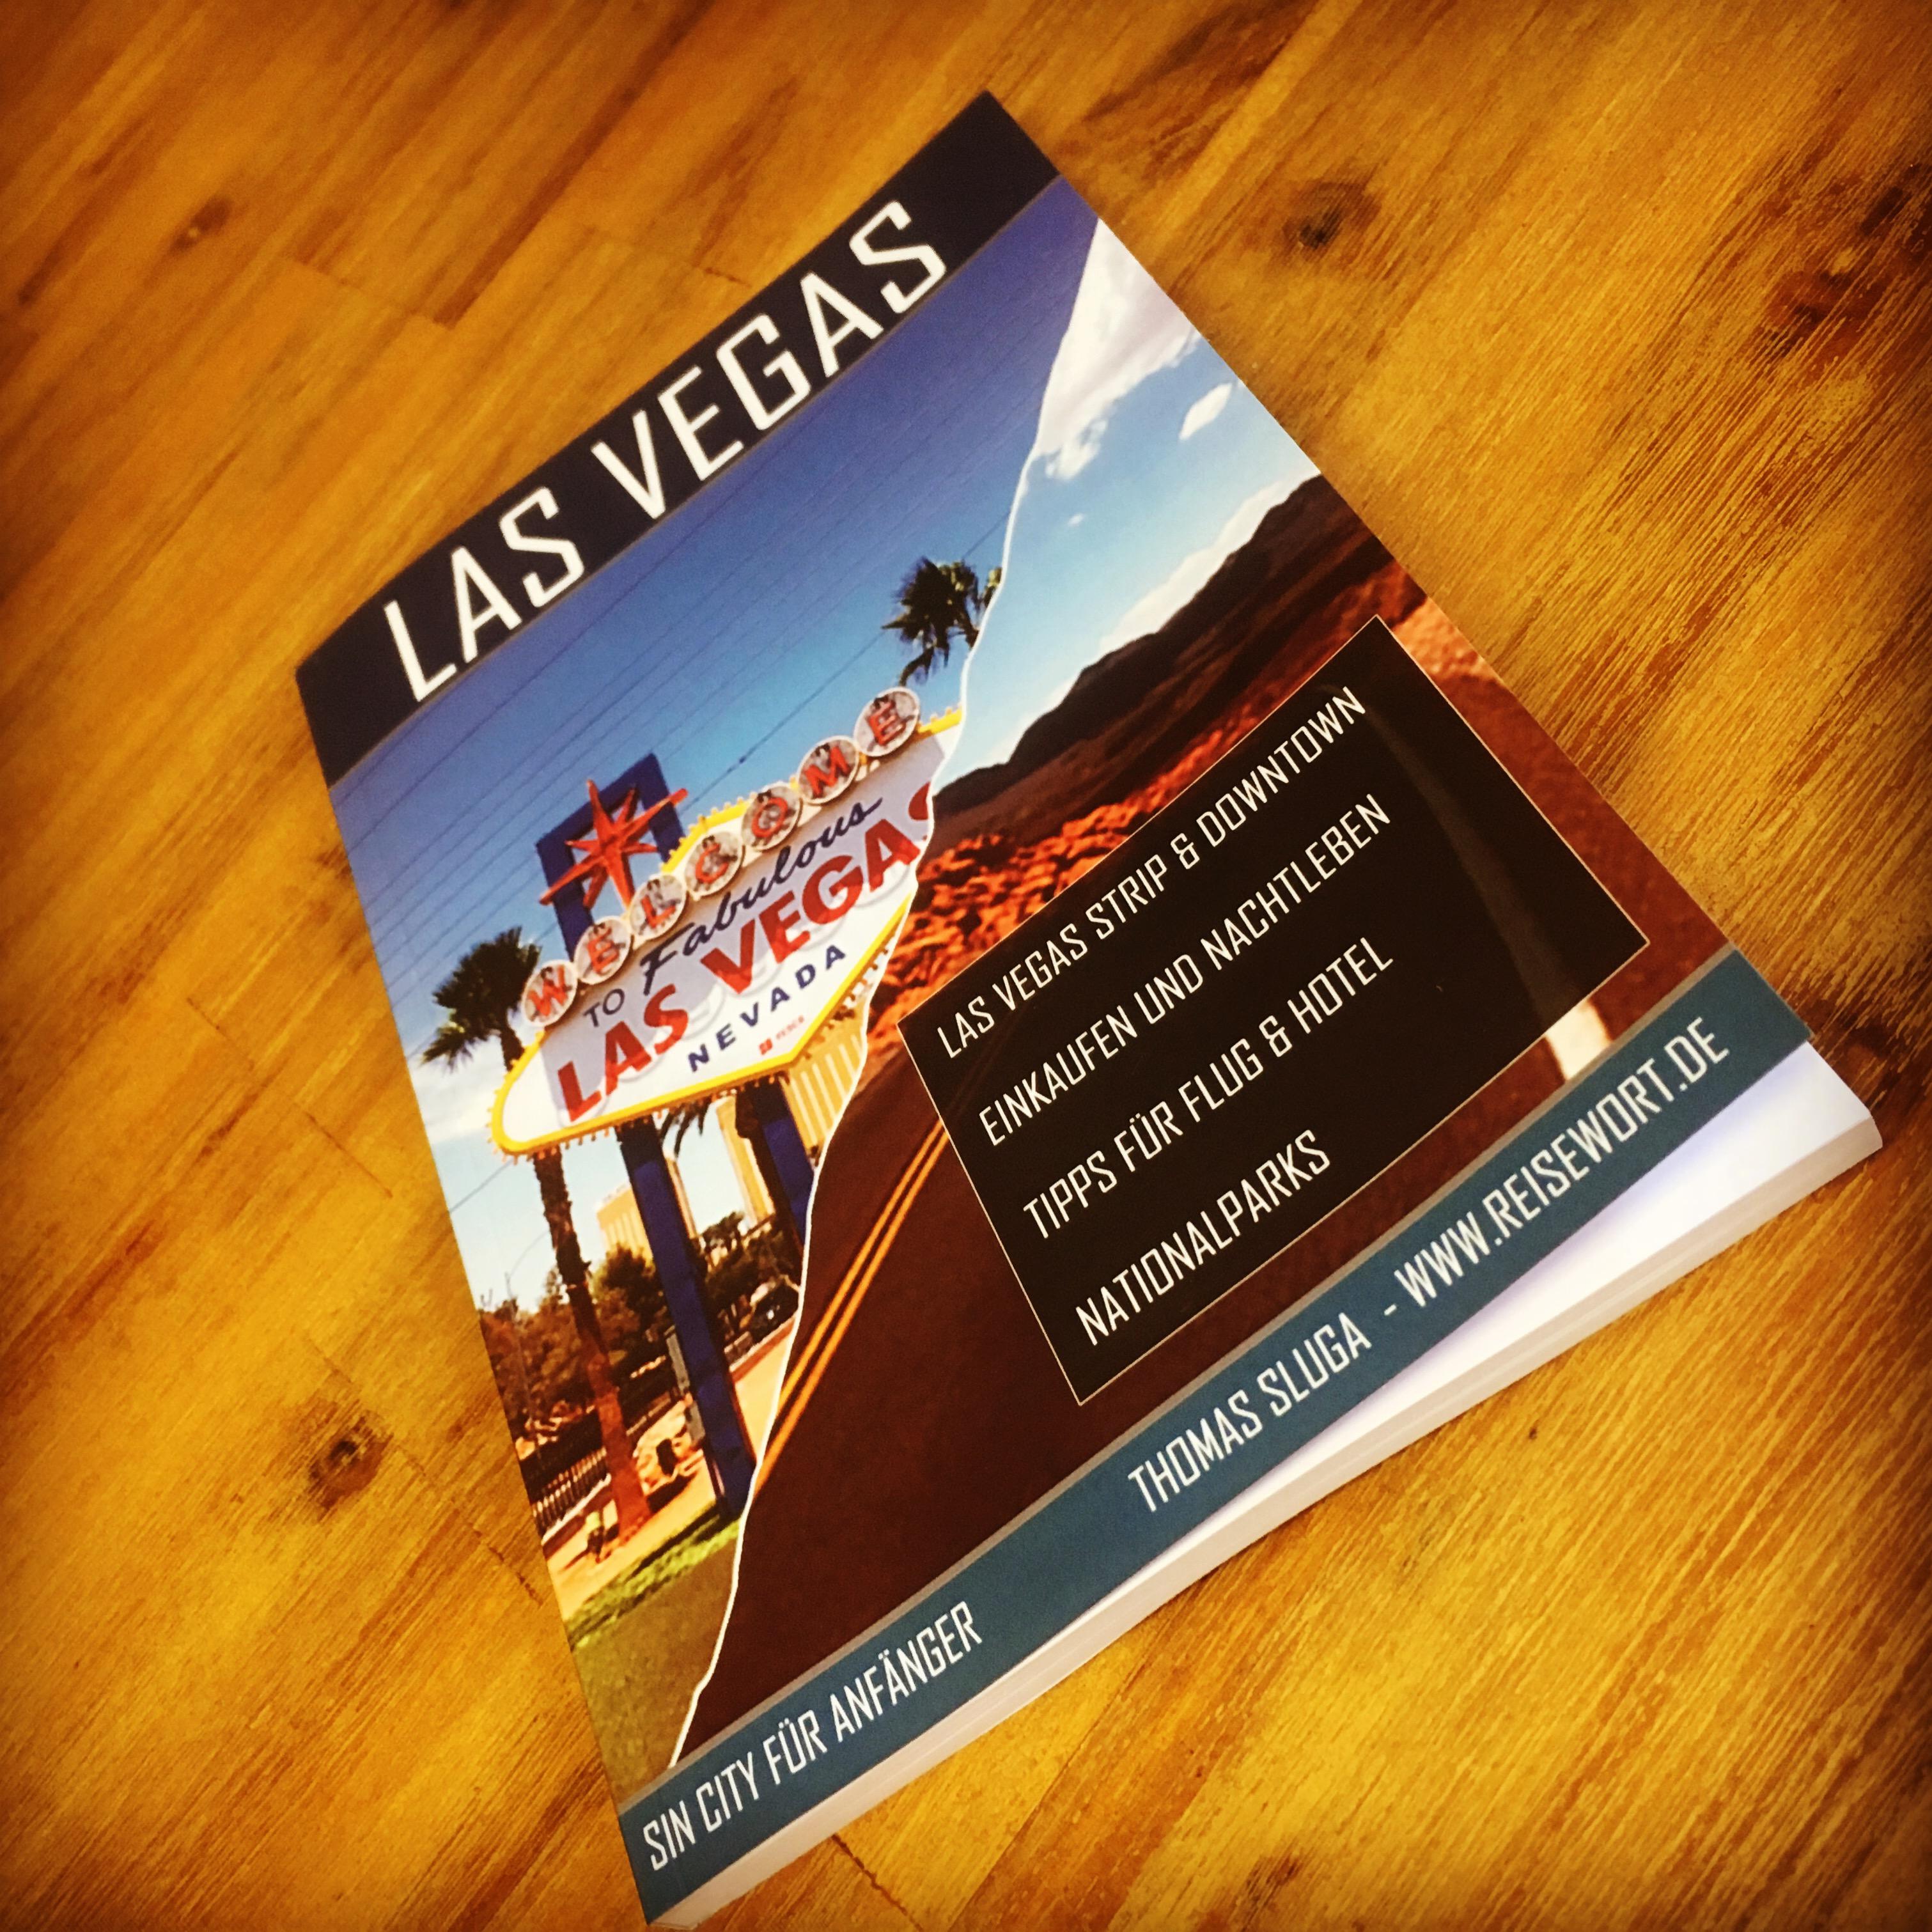 Las Vegas Reiseführer